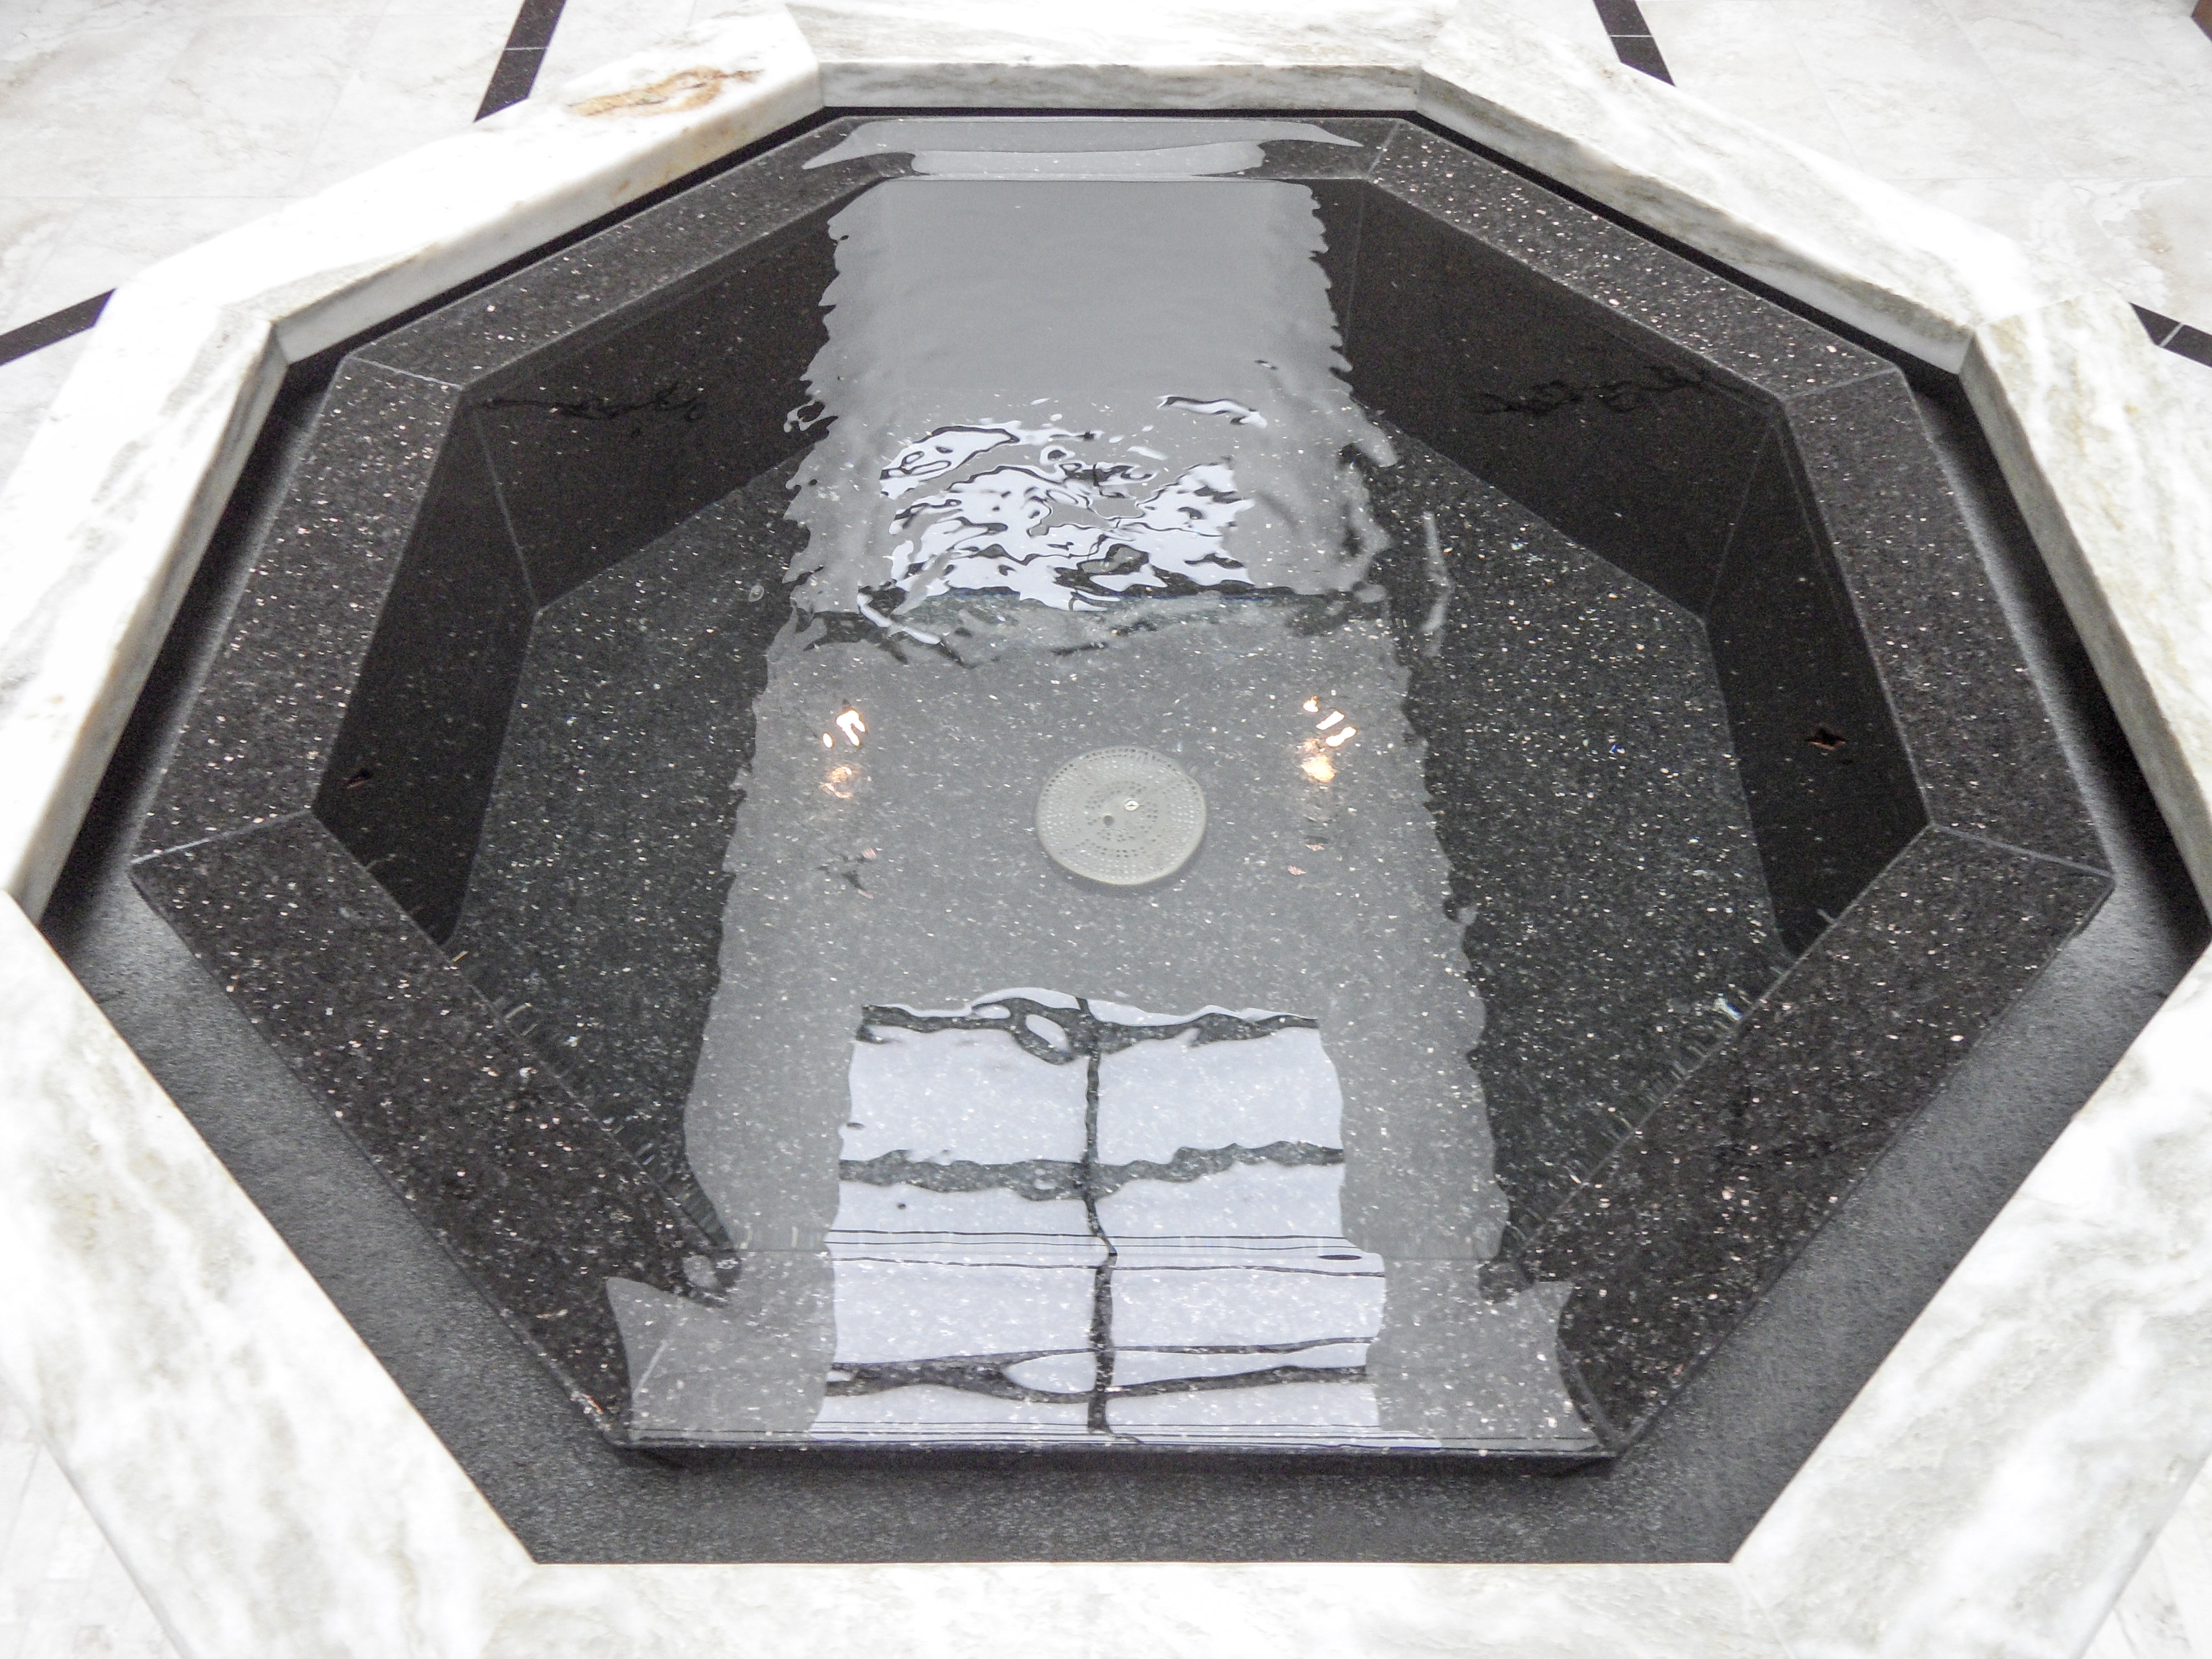 Negative Edge Baptismal Font, Our Lady of Lourdes, Dunedin, FL.